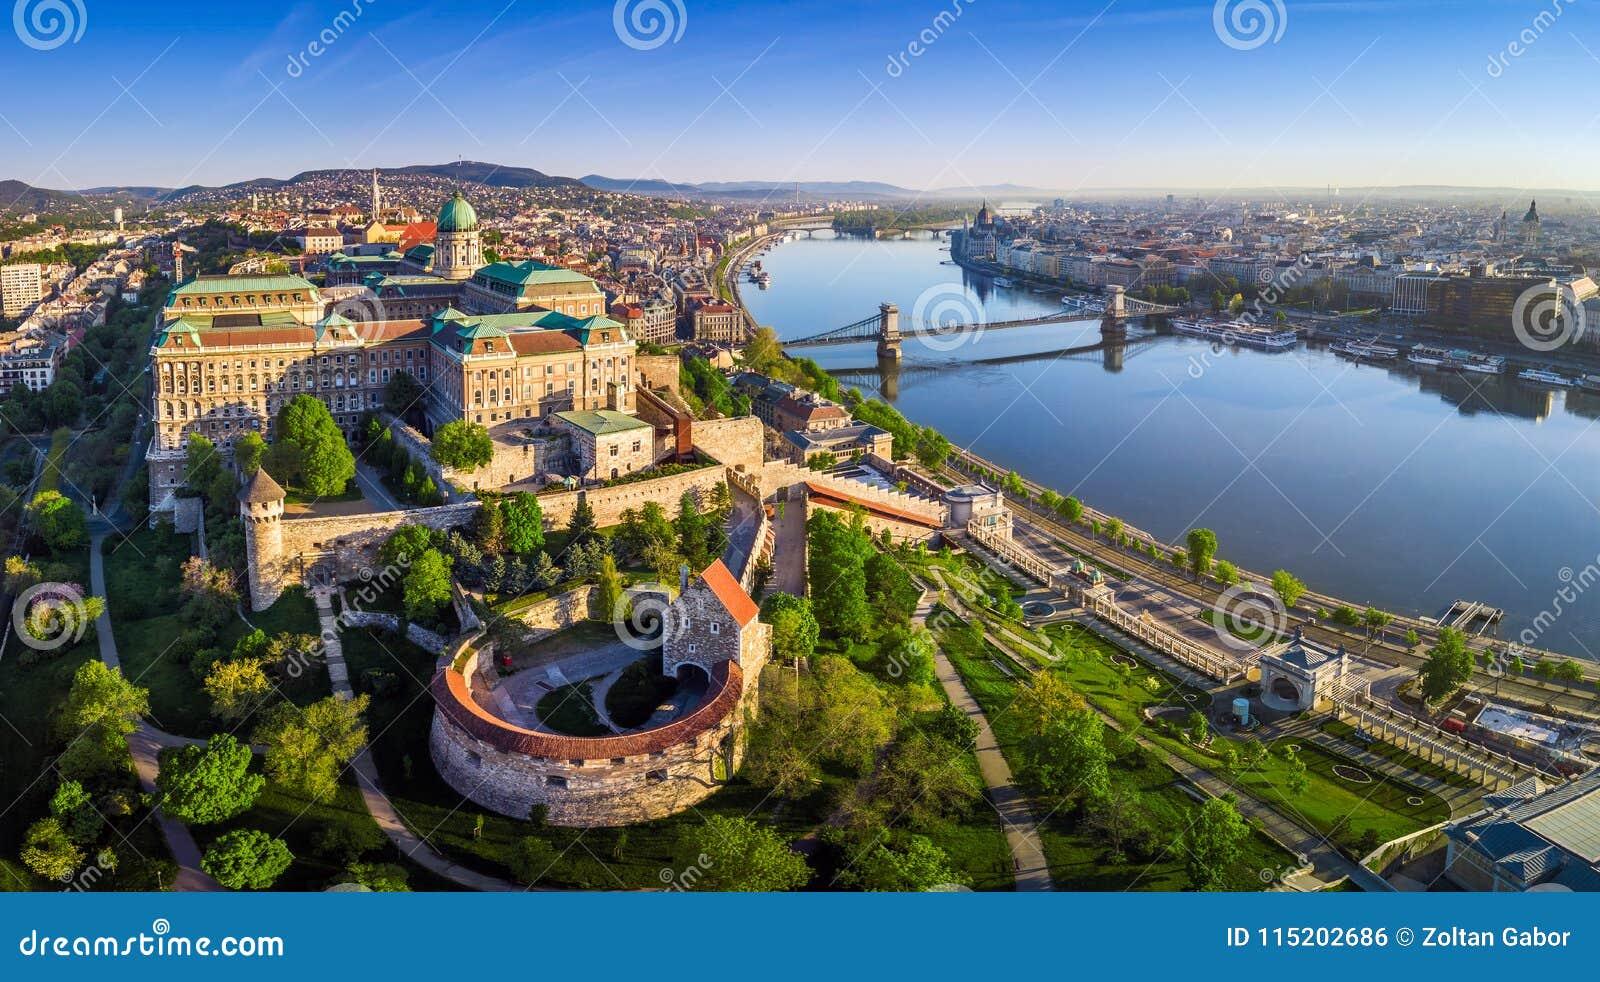 Budapest, Hungary - Aerial panoramic skyline view of Buda Castle Royal Palace with Szechenyi Chain Bridge